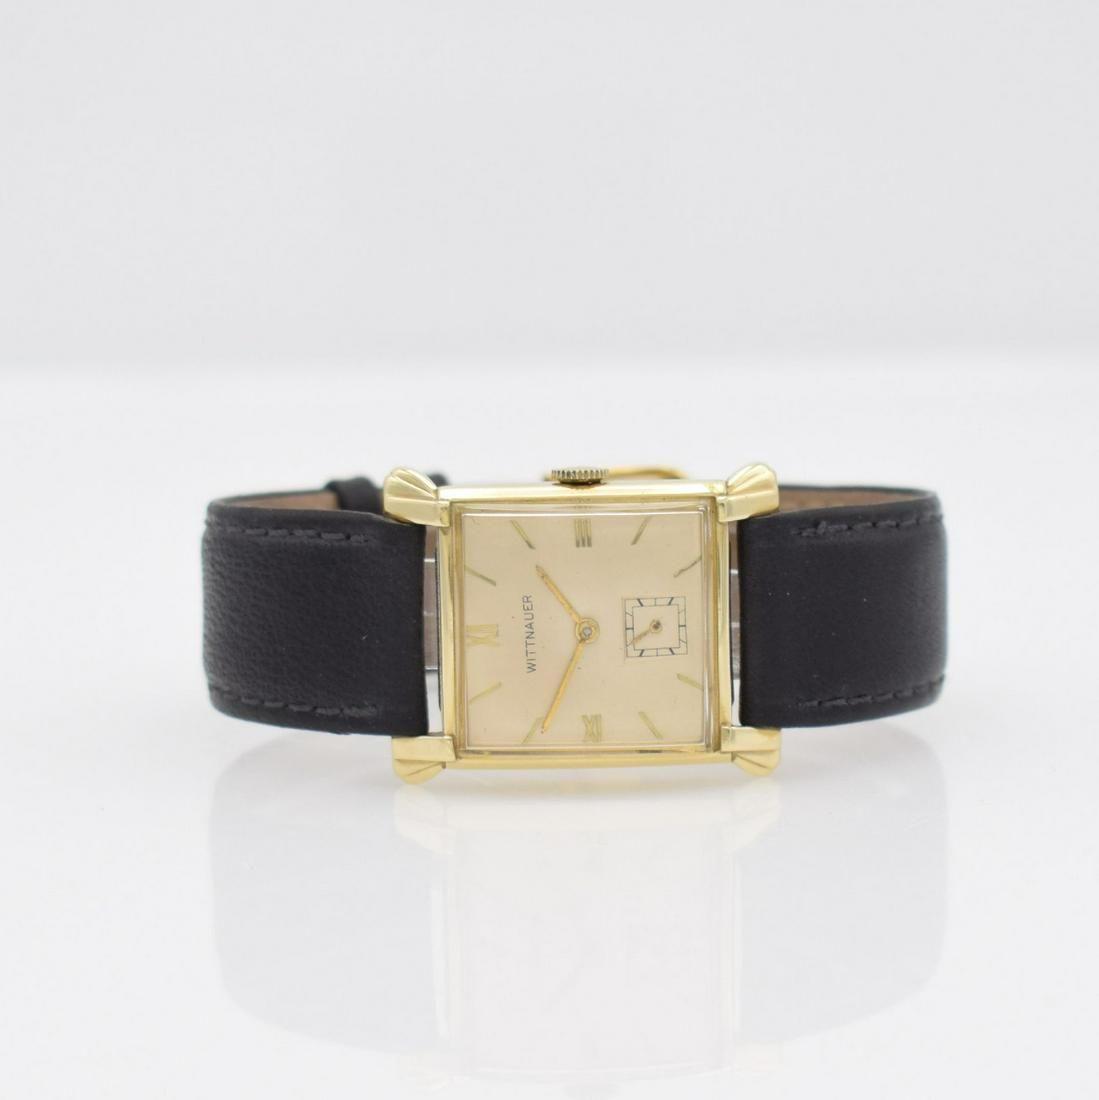 LONGINES - WITTNAUER 14k yellow gold wristwatch